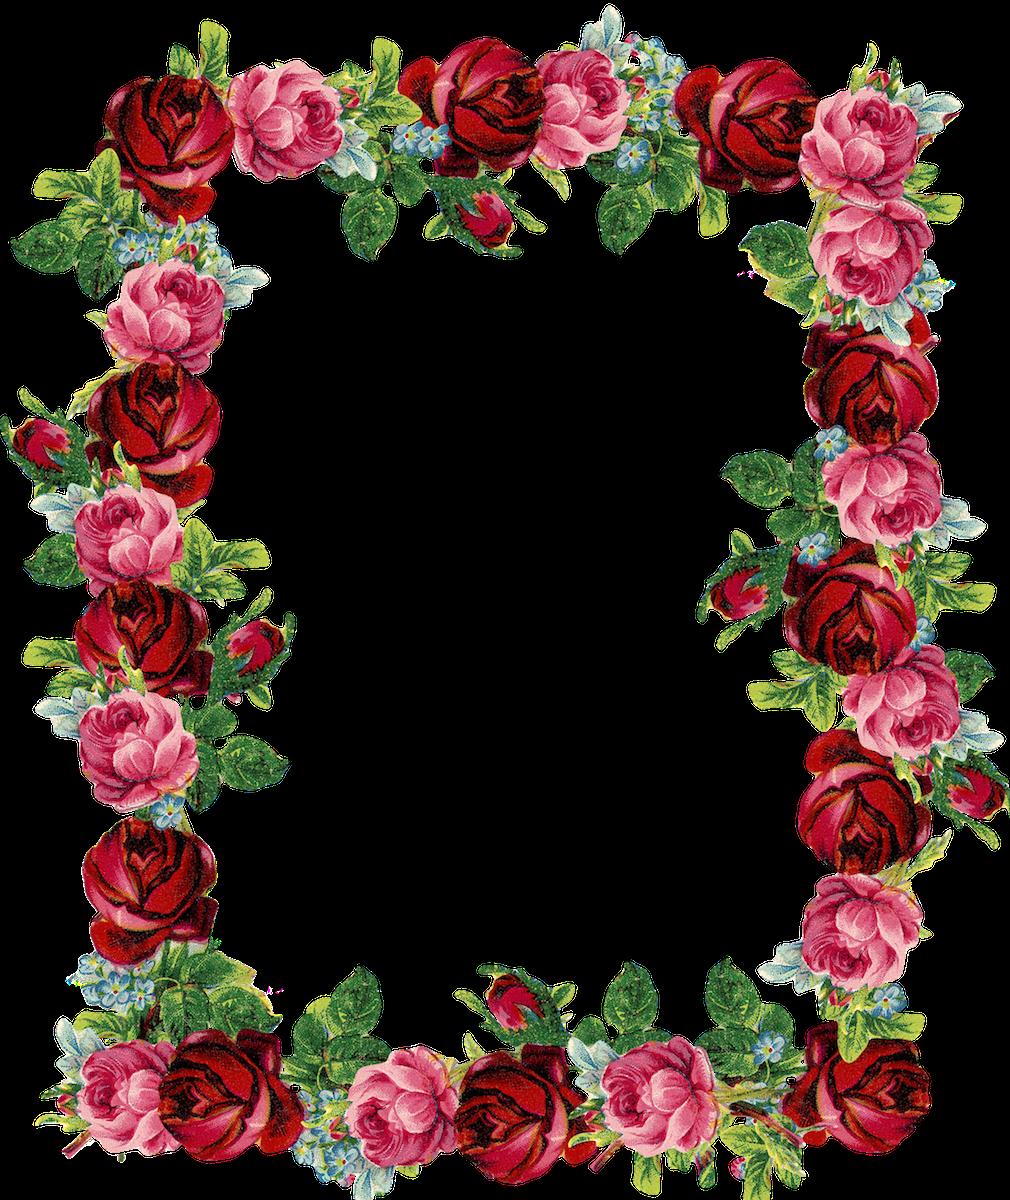 Free digital vintage rose frame and border png - Rosenrahmen - freebie |  MeinLilaPark u2013 DIY - Heart Border PNG HD